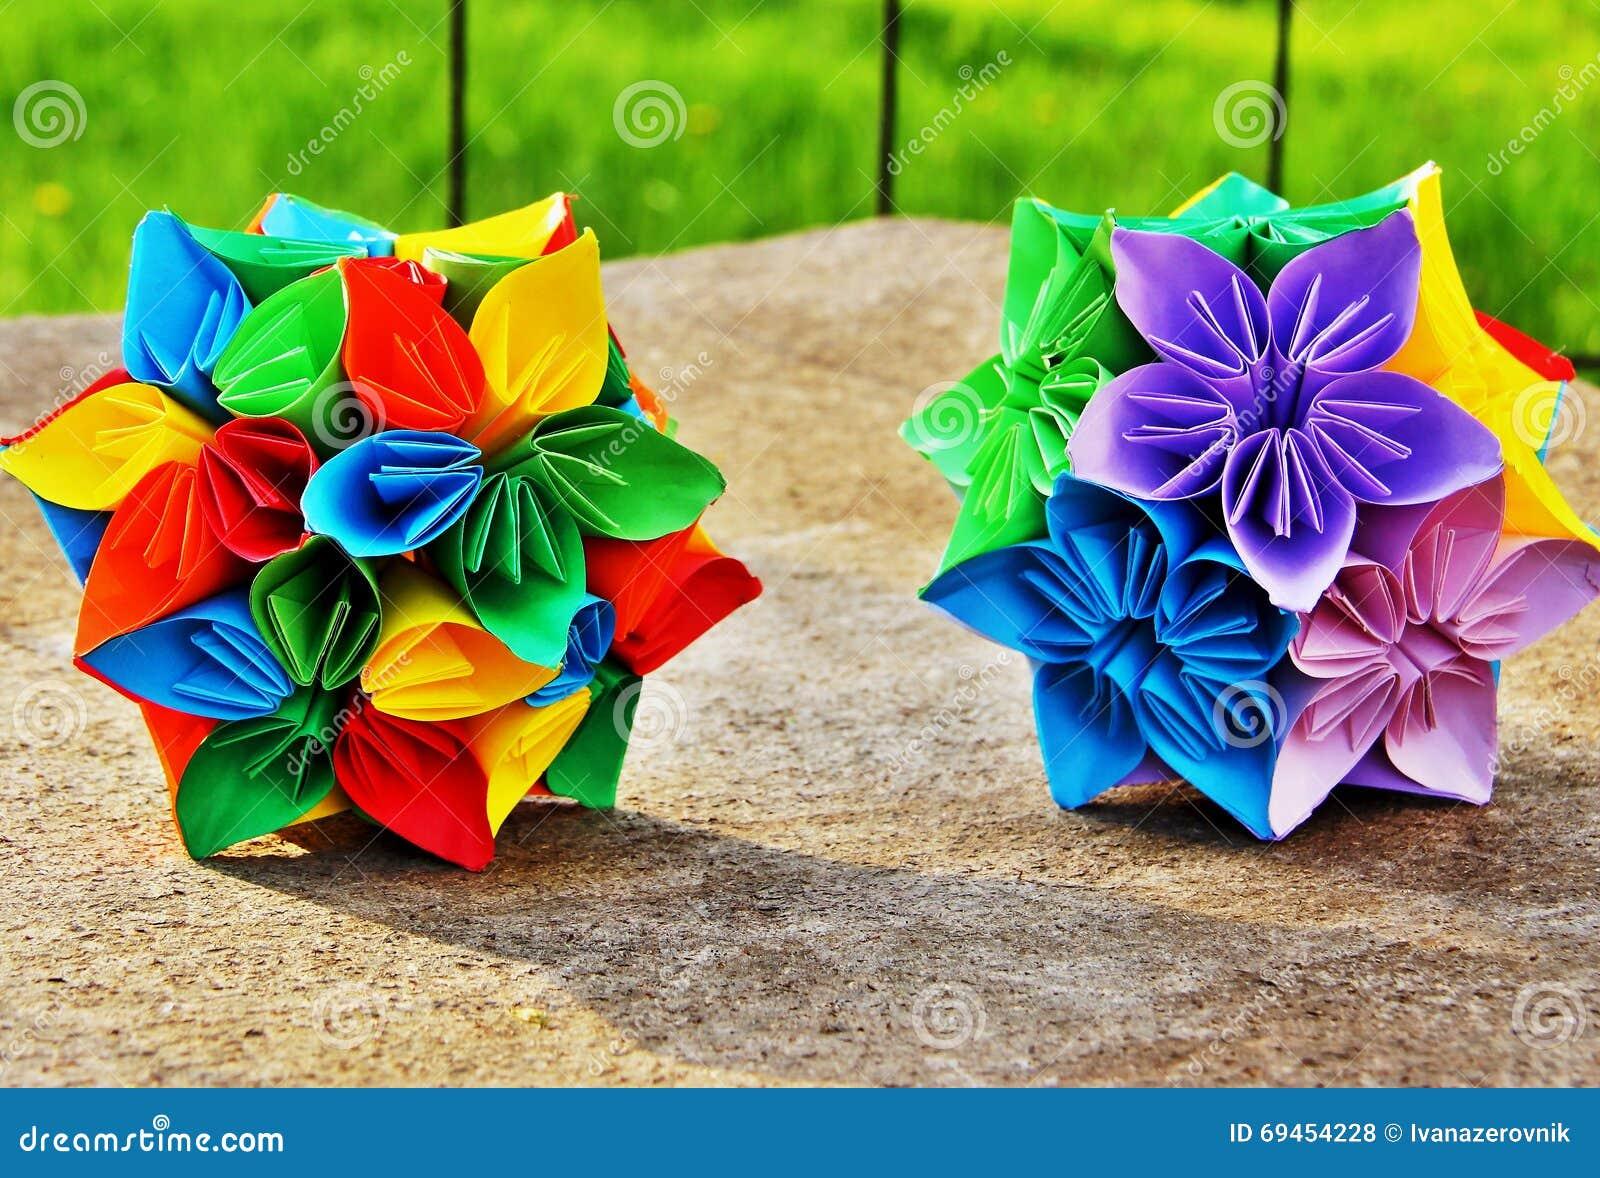 Origami flower balls in vibrant colors stock photo image of origami flower balls in vibrant colors mightylinksfo